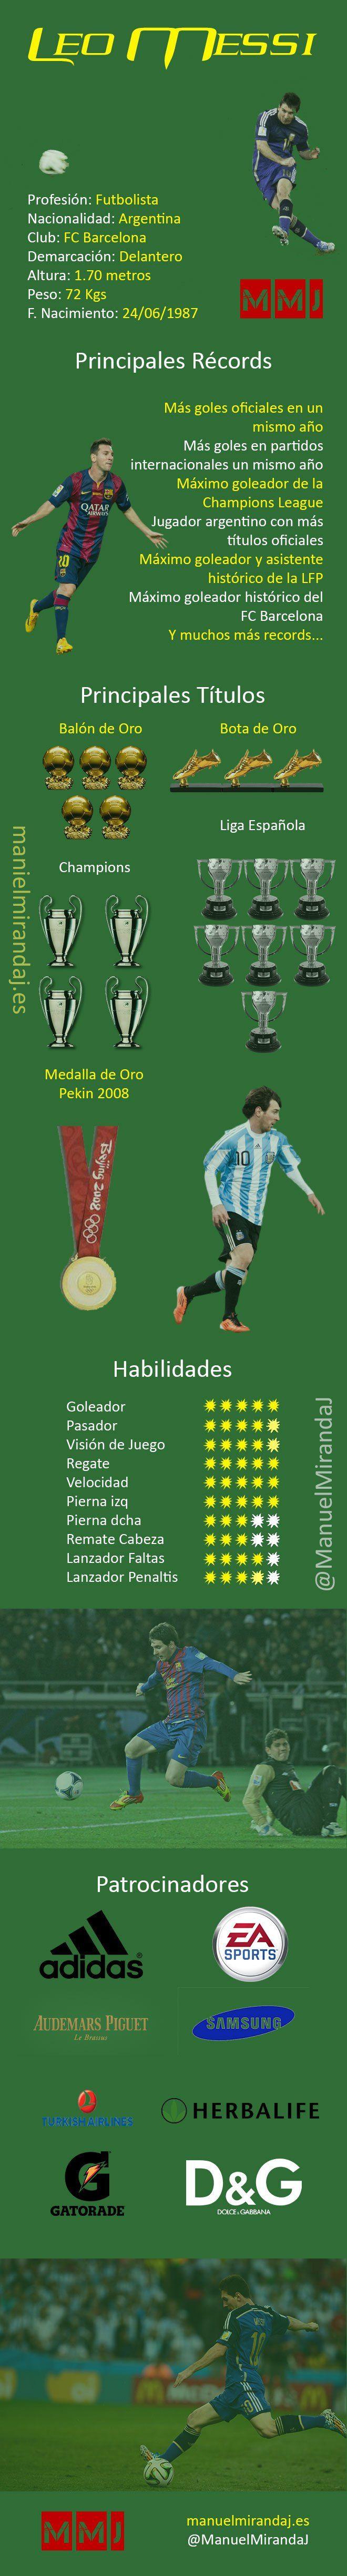 #curriculum #infografico leo messi ;-) #LeoMesi #Futbol #Futbolista #Barça #Deporte #CV #Currículo #RRHH